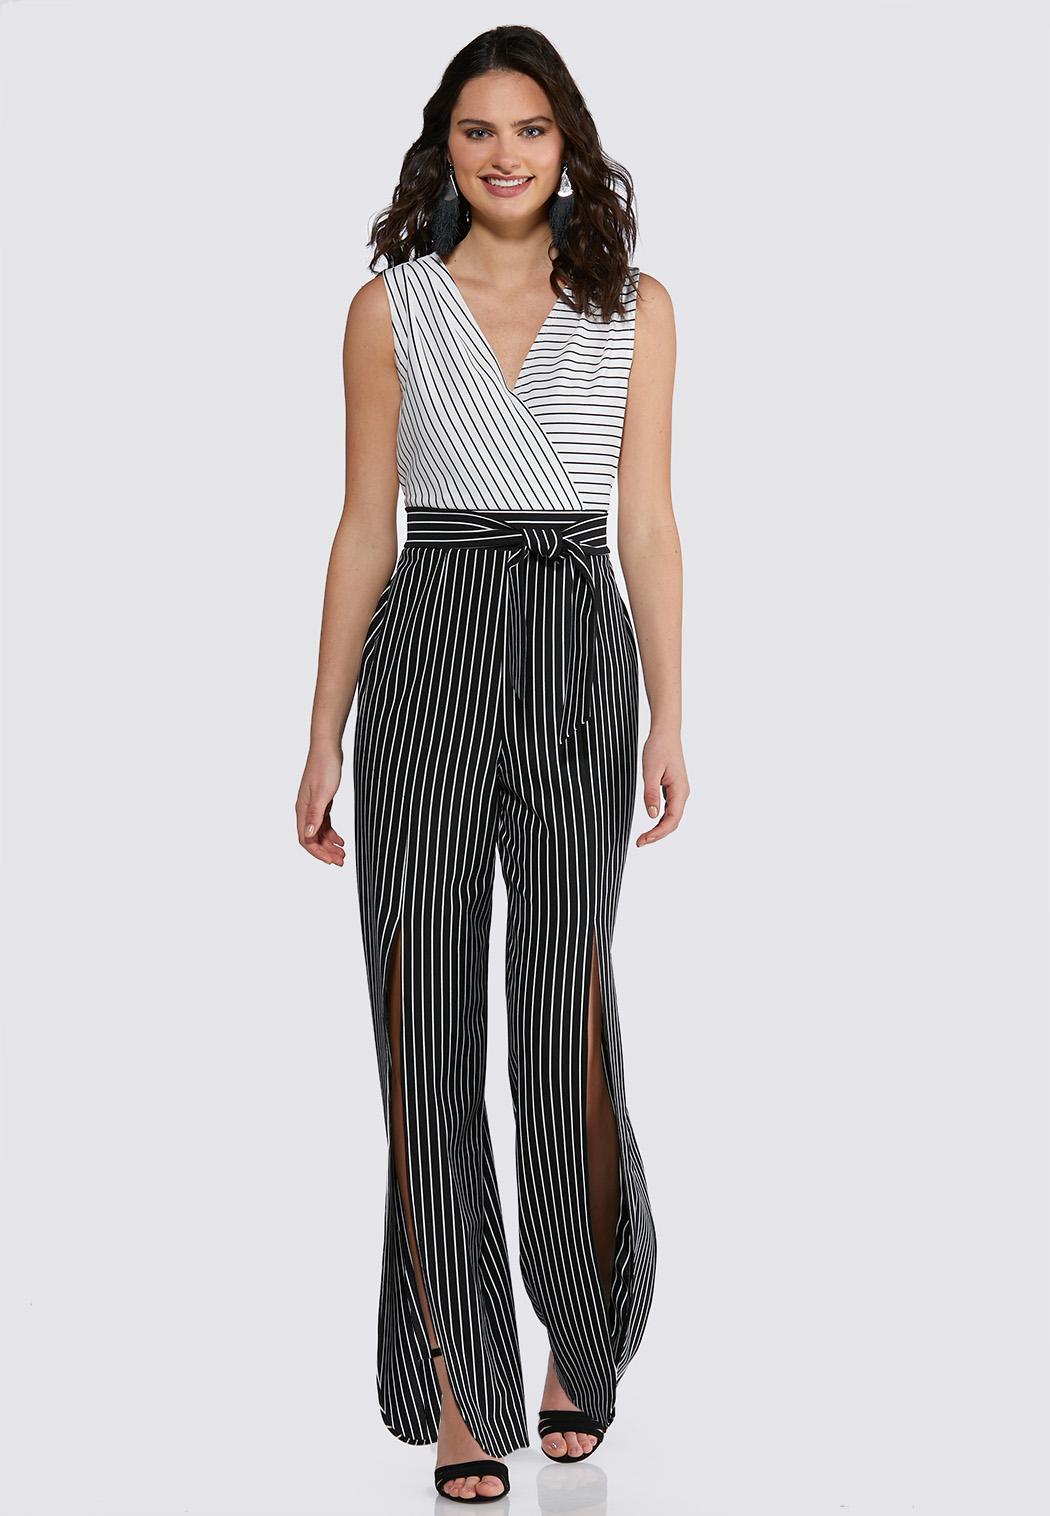 Petite Black And White Slit Pant Jumpsuit